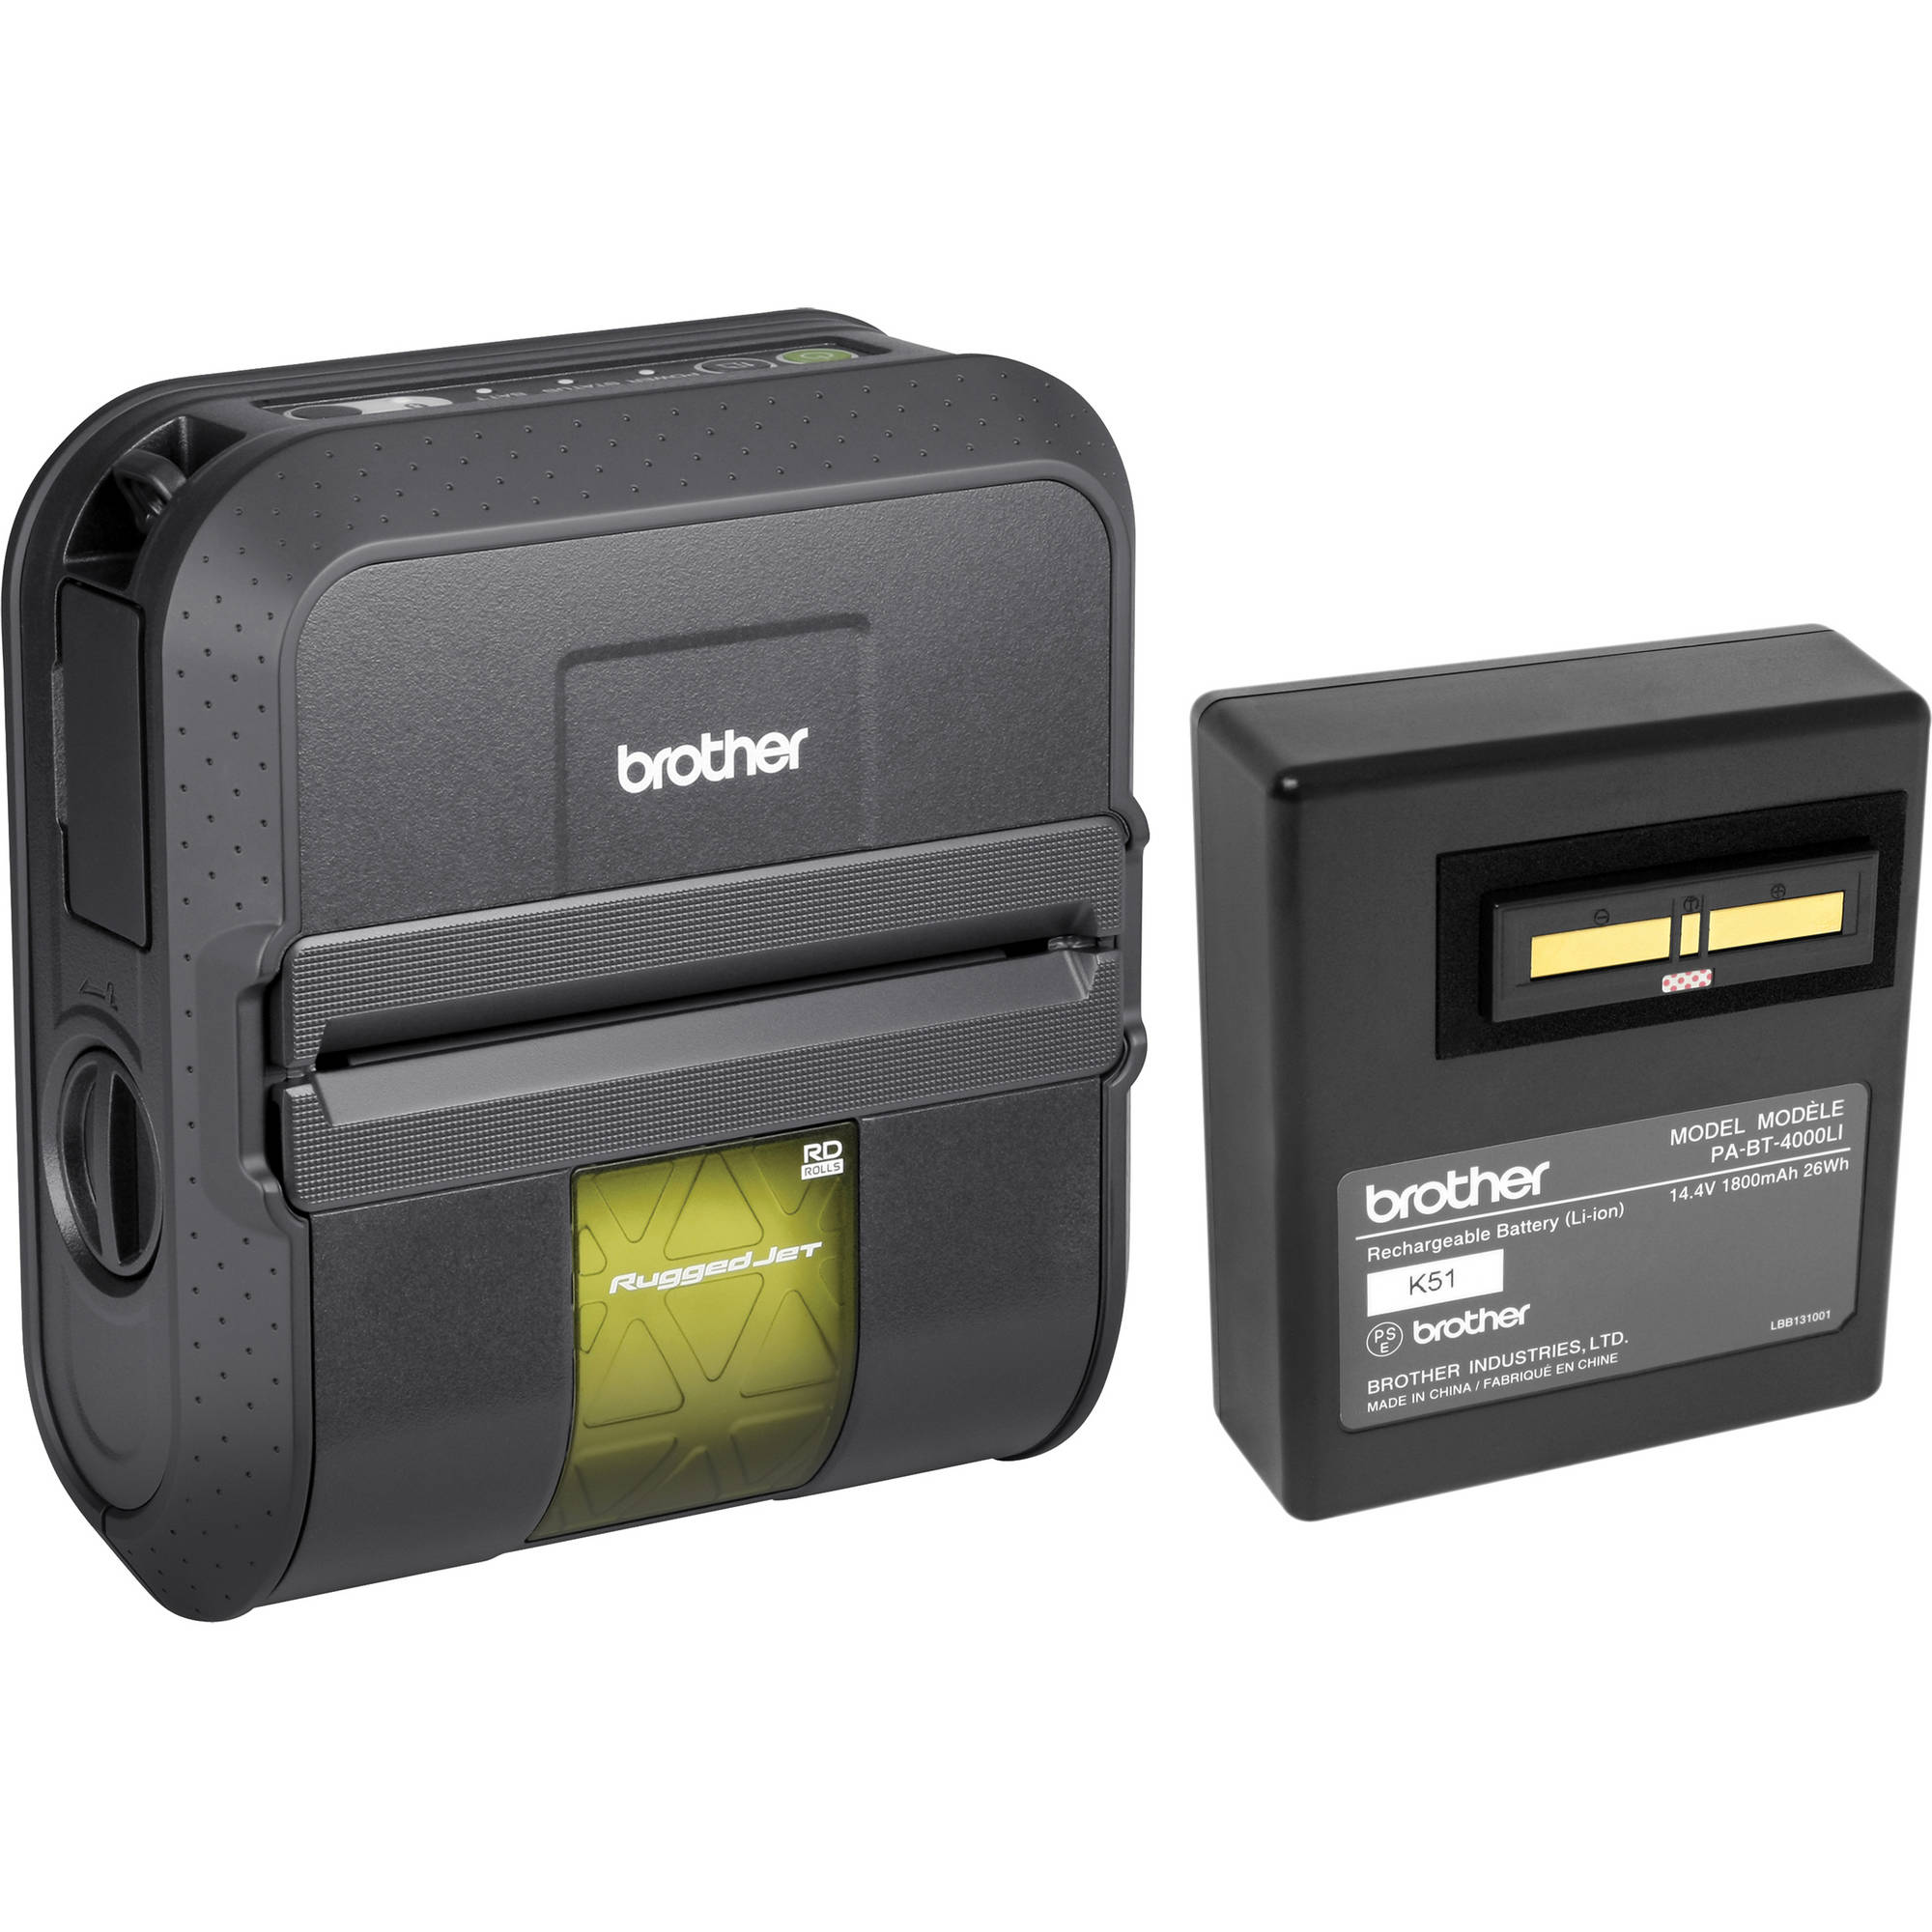 Brother PA-BT-4000LI 1800mAh Mobile Printer Battery